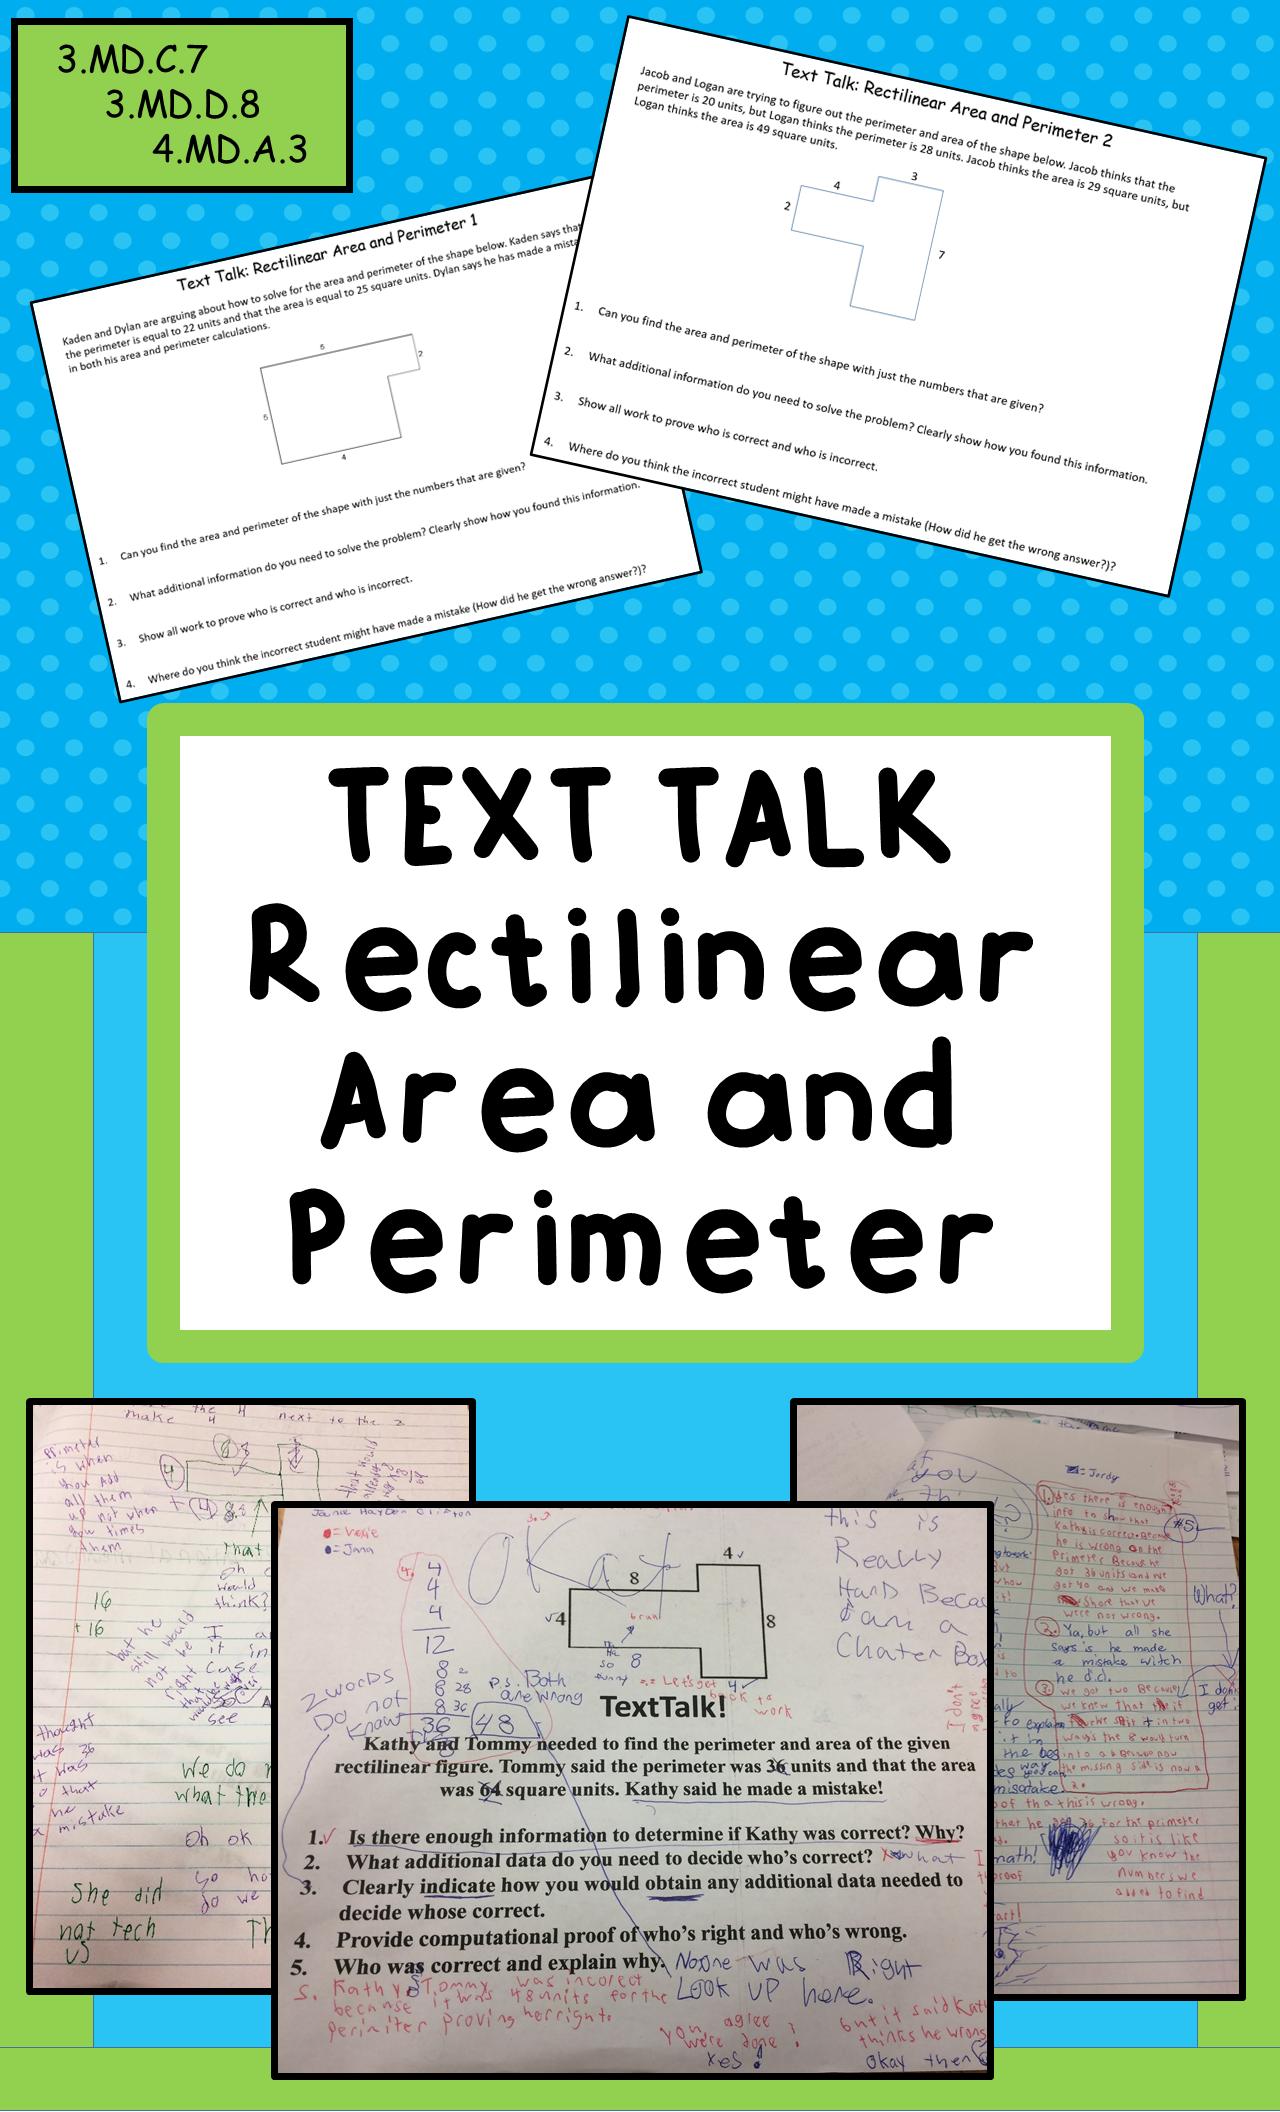 Text Talk Rectilinear Area And Perimeter Tasks Grades 3